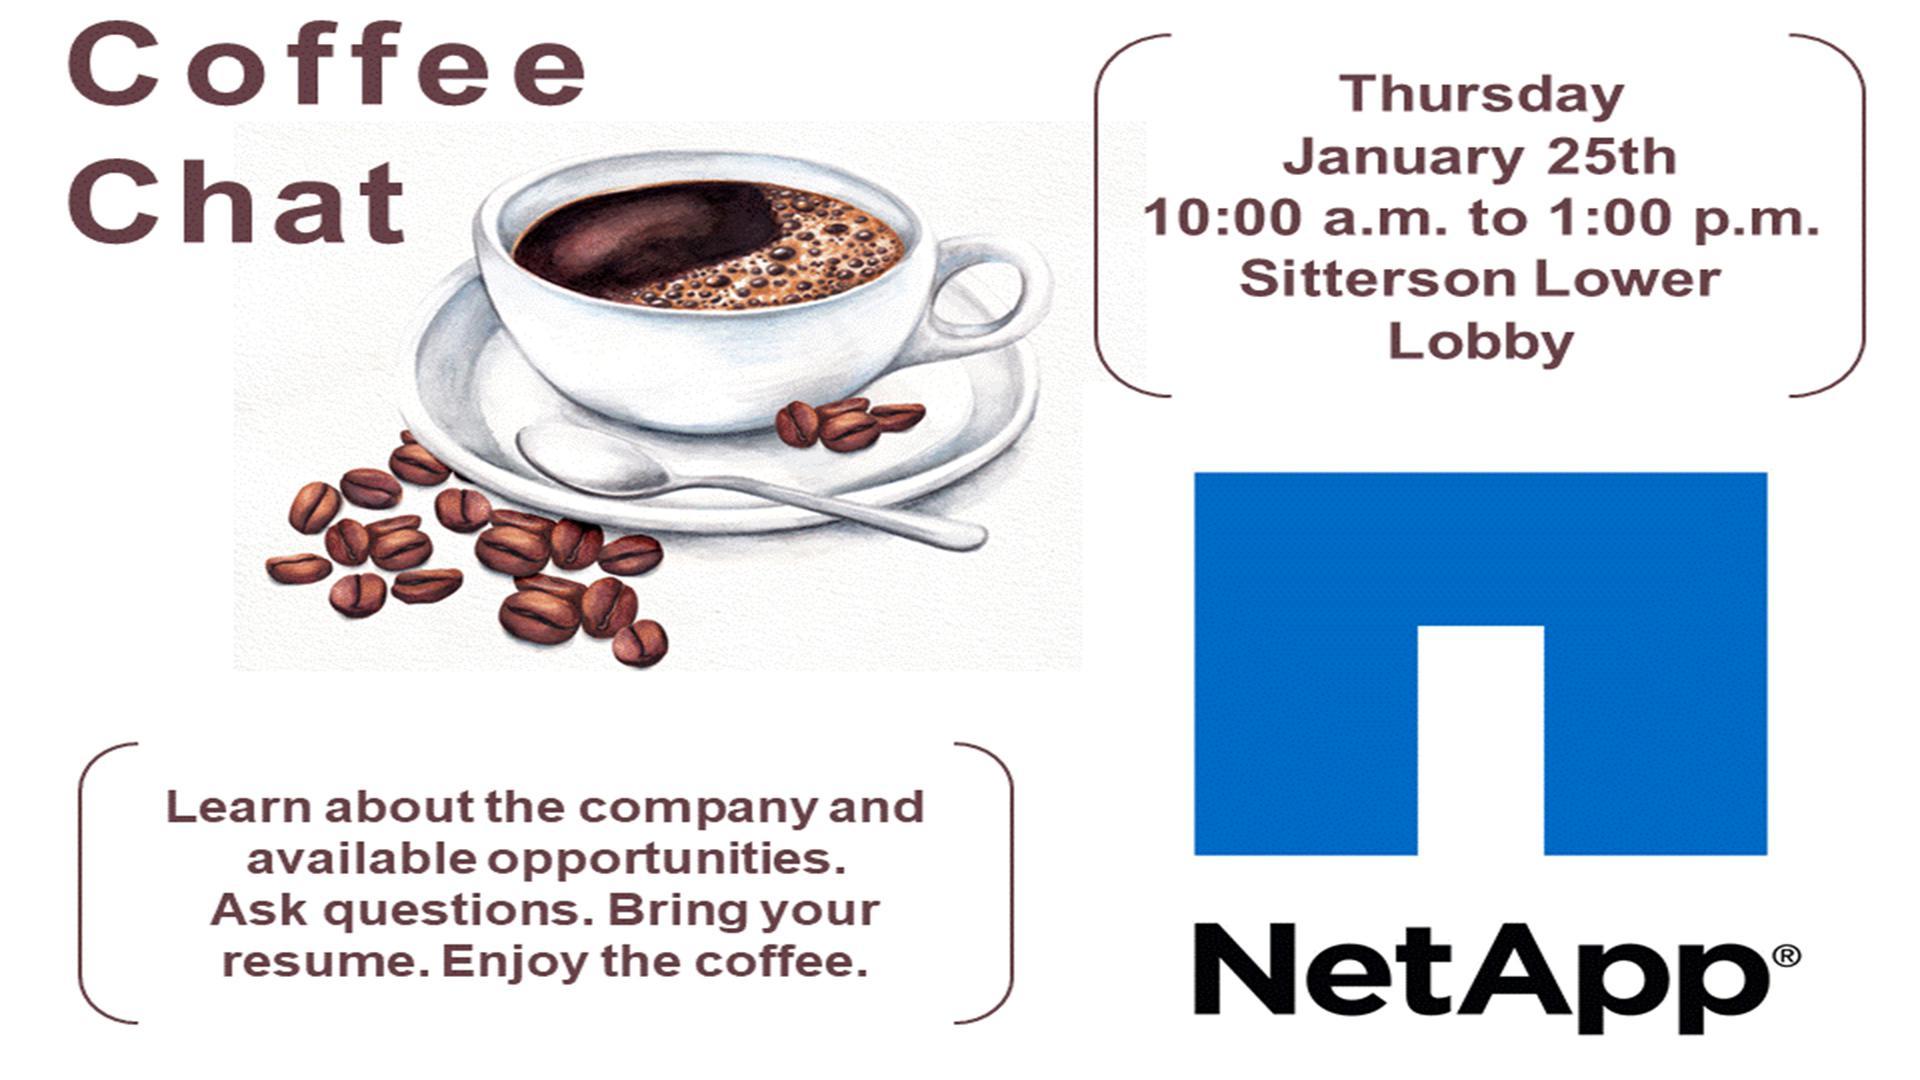 NetApp Coffee Chat